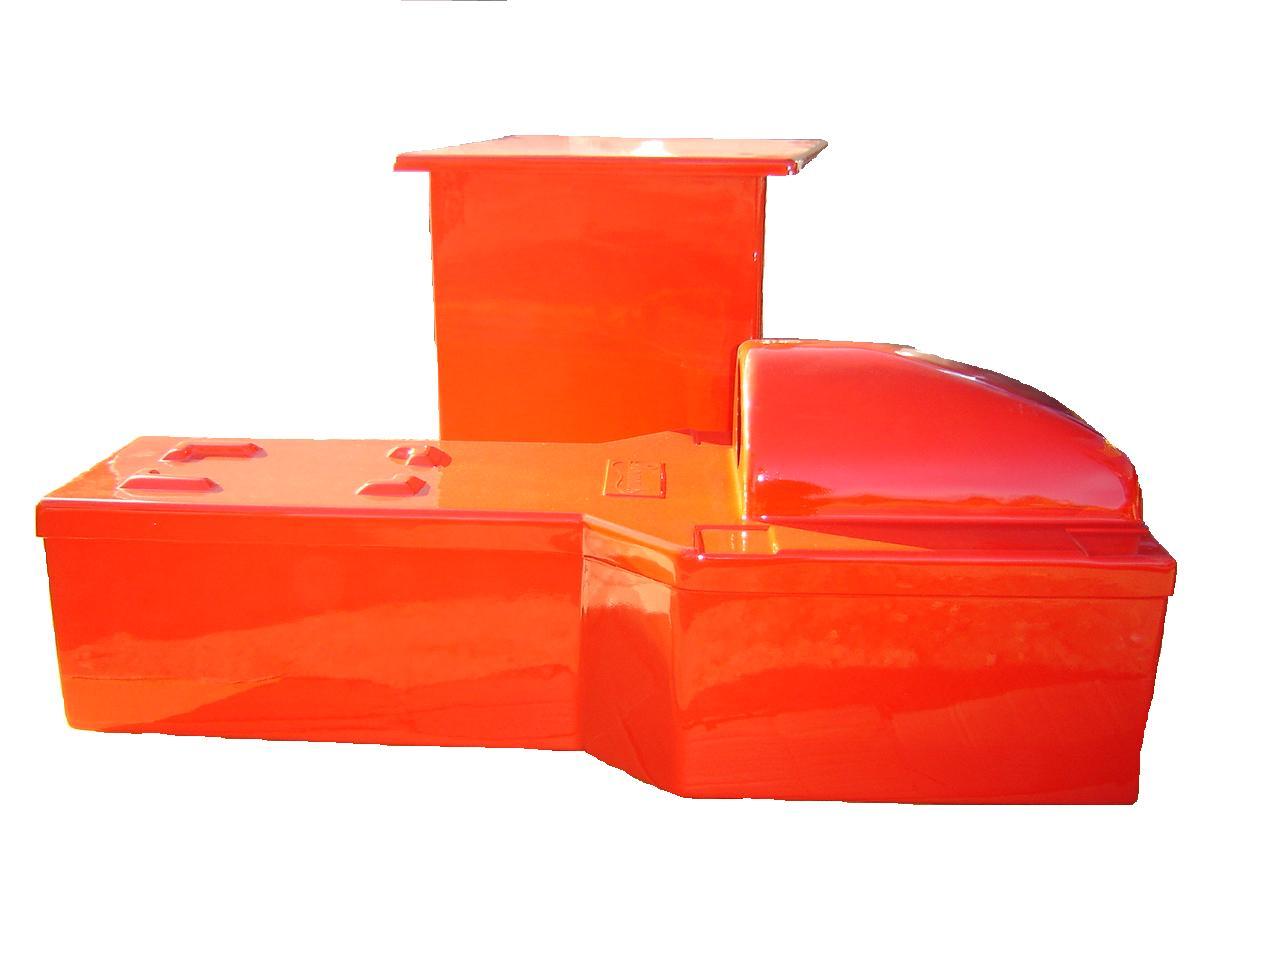 brise-jet-1.jpg